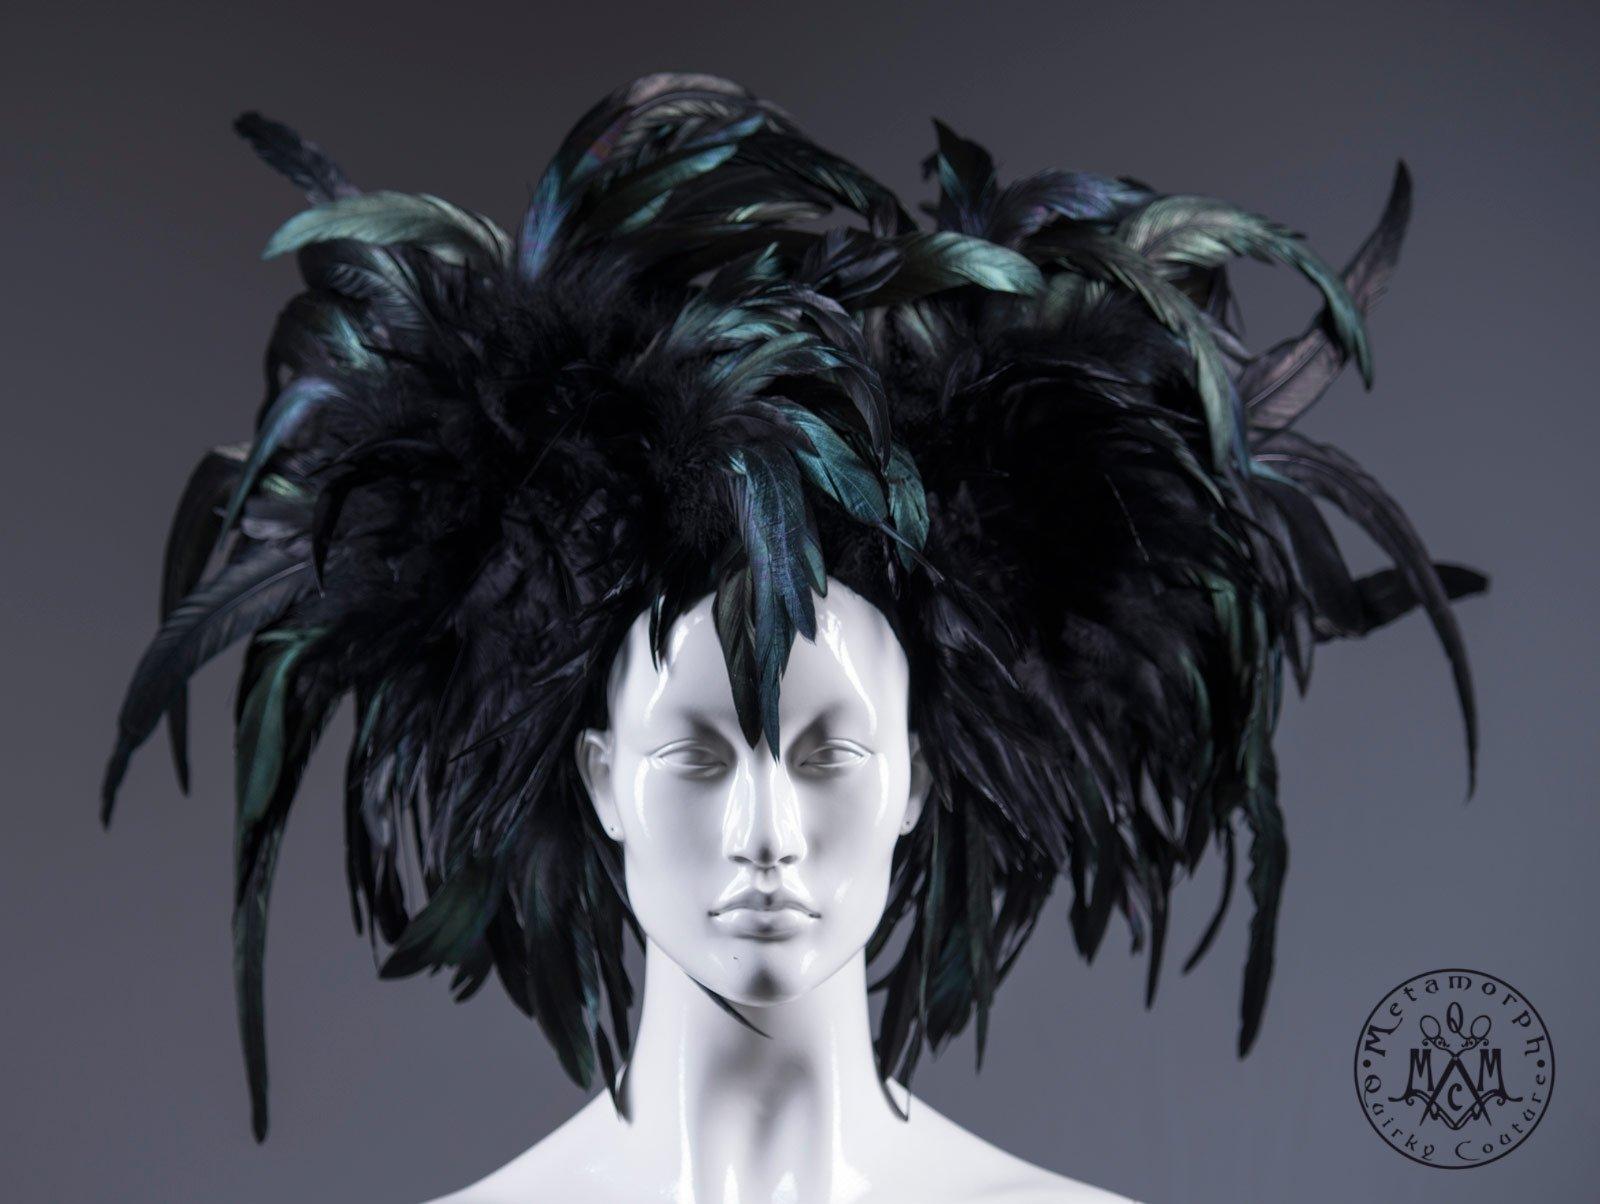 Black Mardi Gras headdress / Rooster feather headpiece / Dark fashion headdress / Burning man headpiece / Burlesque